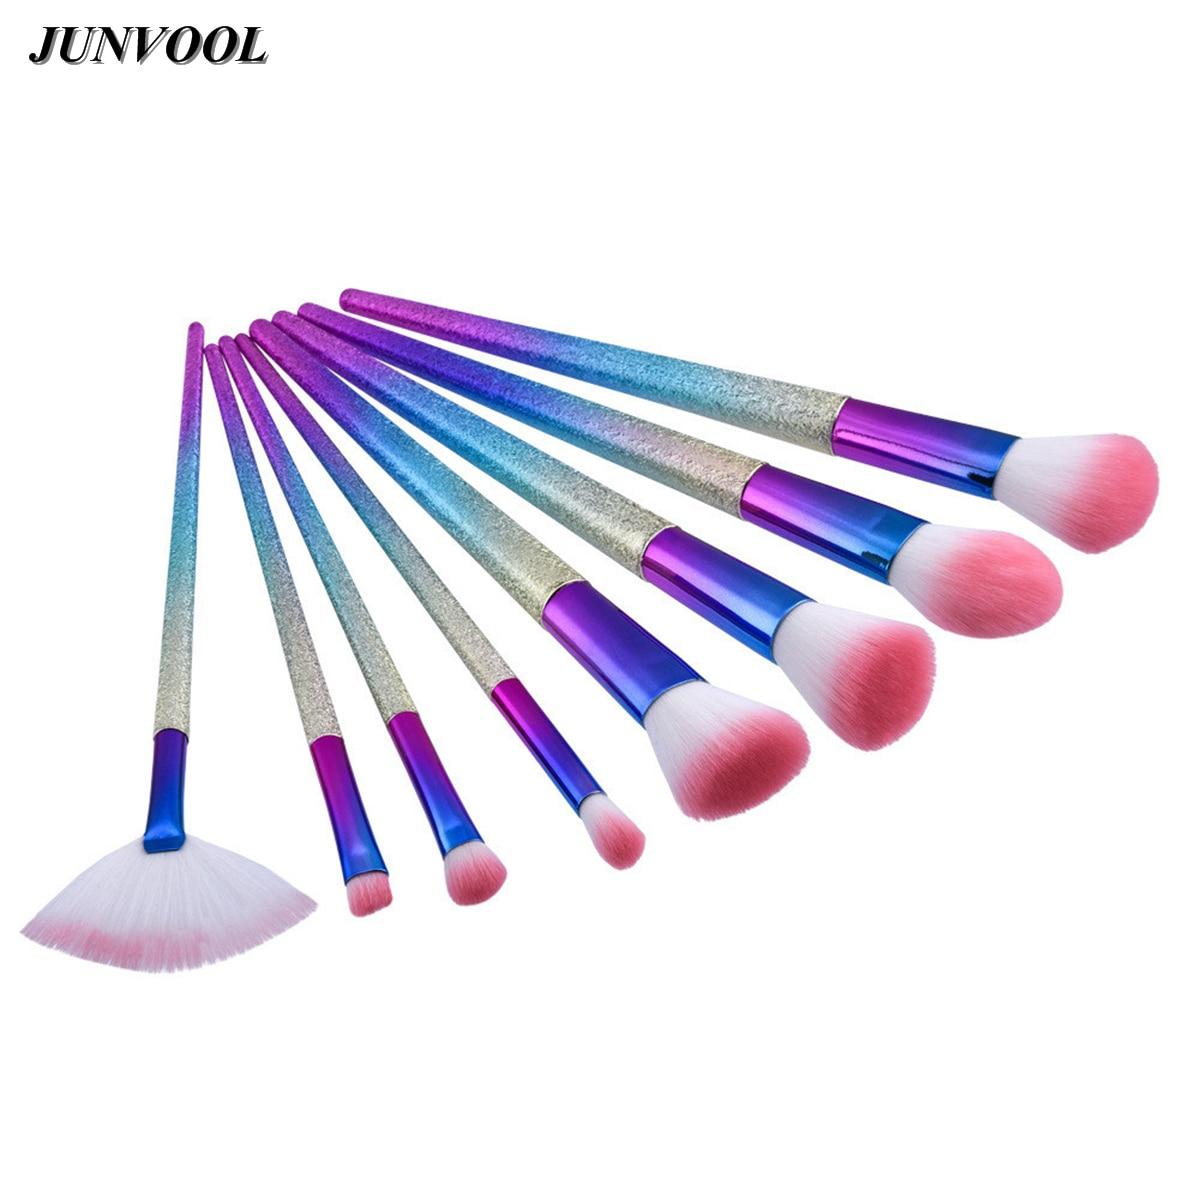 Fantasy Rainbow Makeup Brushes 8PCS Colorful Frosted Glitter Foundation Powder Eyeshadow Kit Gradient Color Makeup Fan Brush Set 7 pcs rainbow glitter ombre makeup brushes set